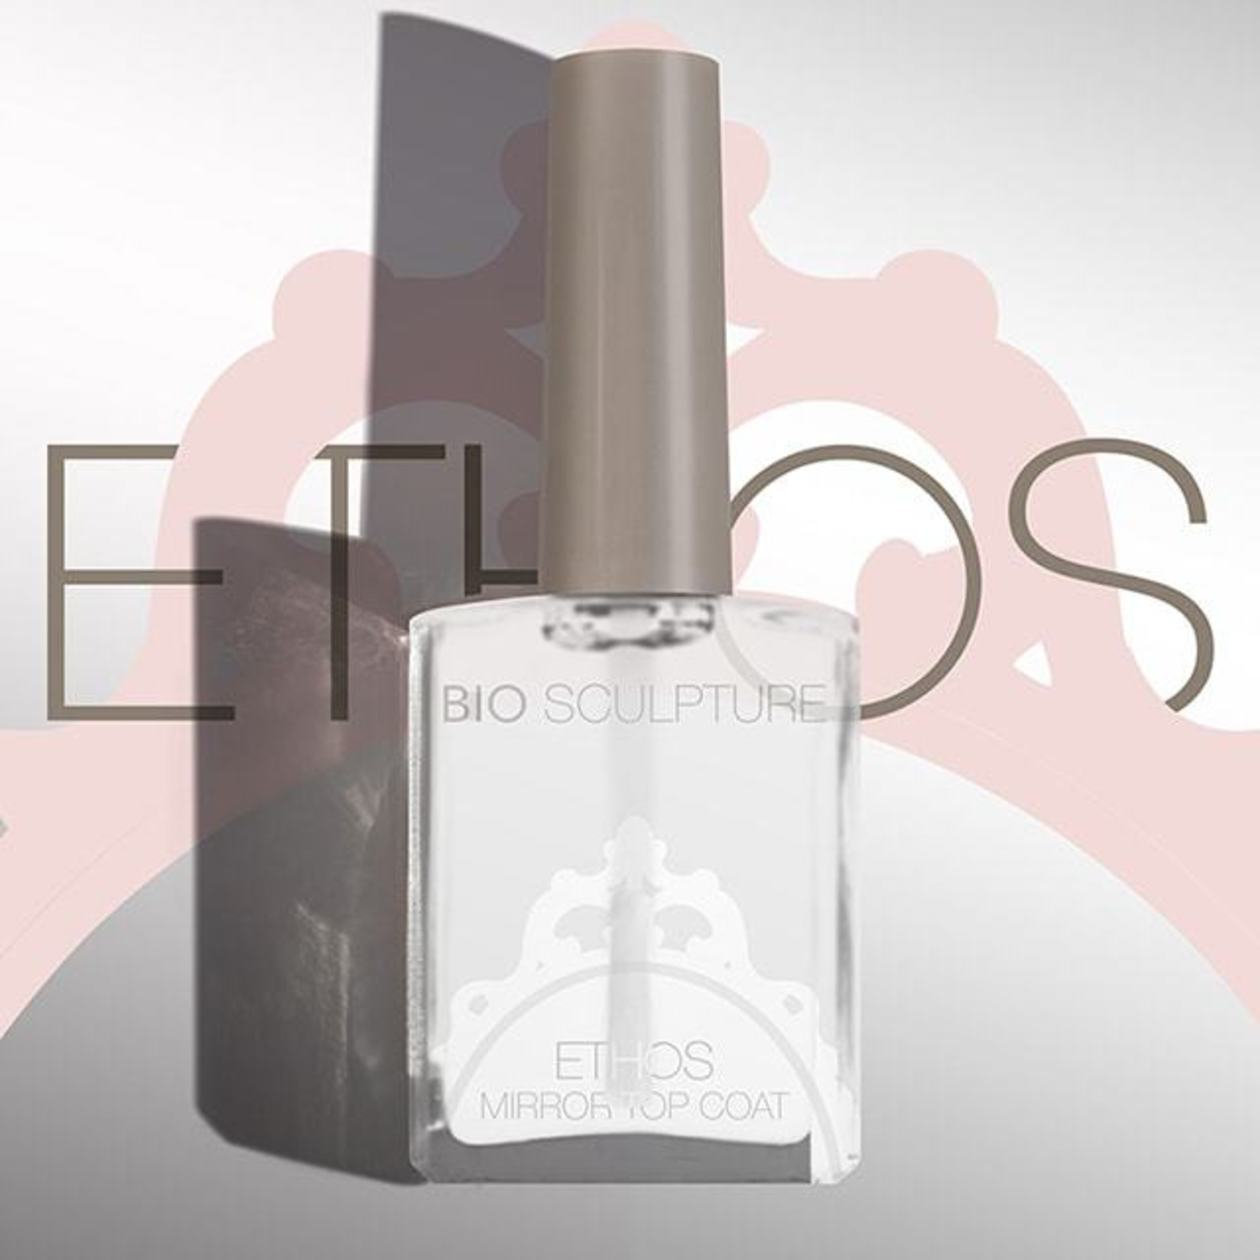 Ethos   Natural Nail Care - Bio Sculpture